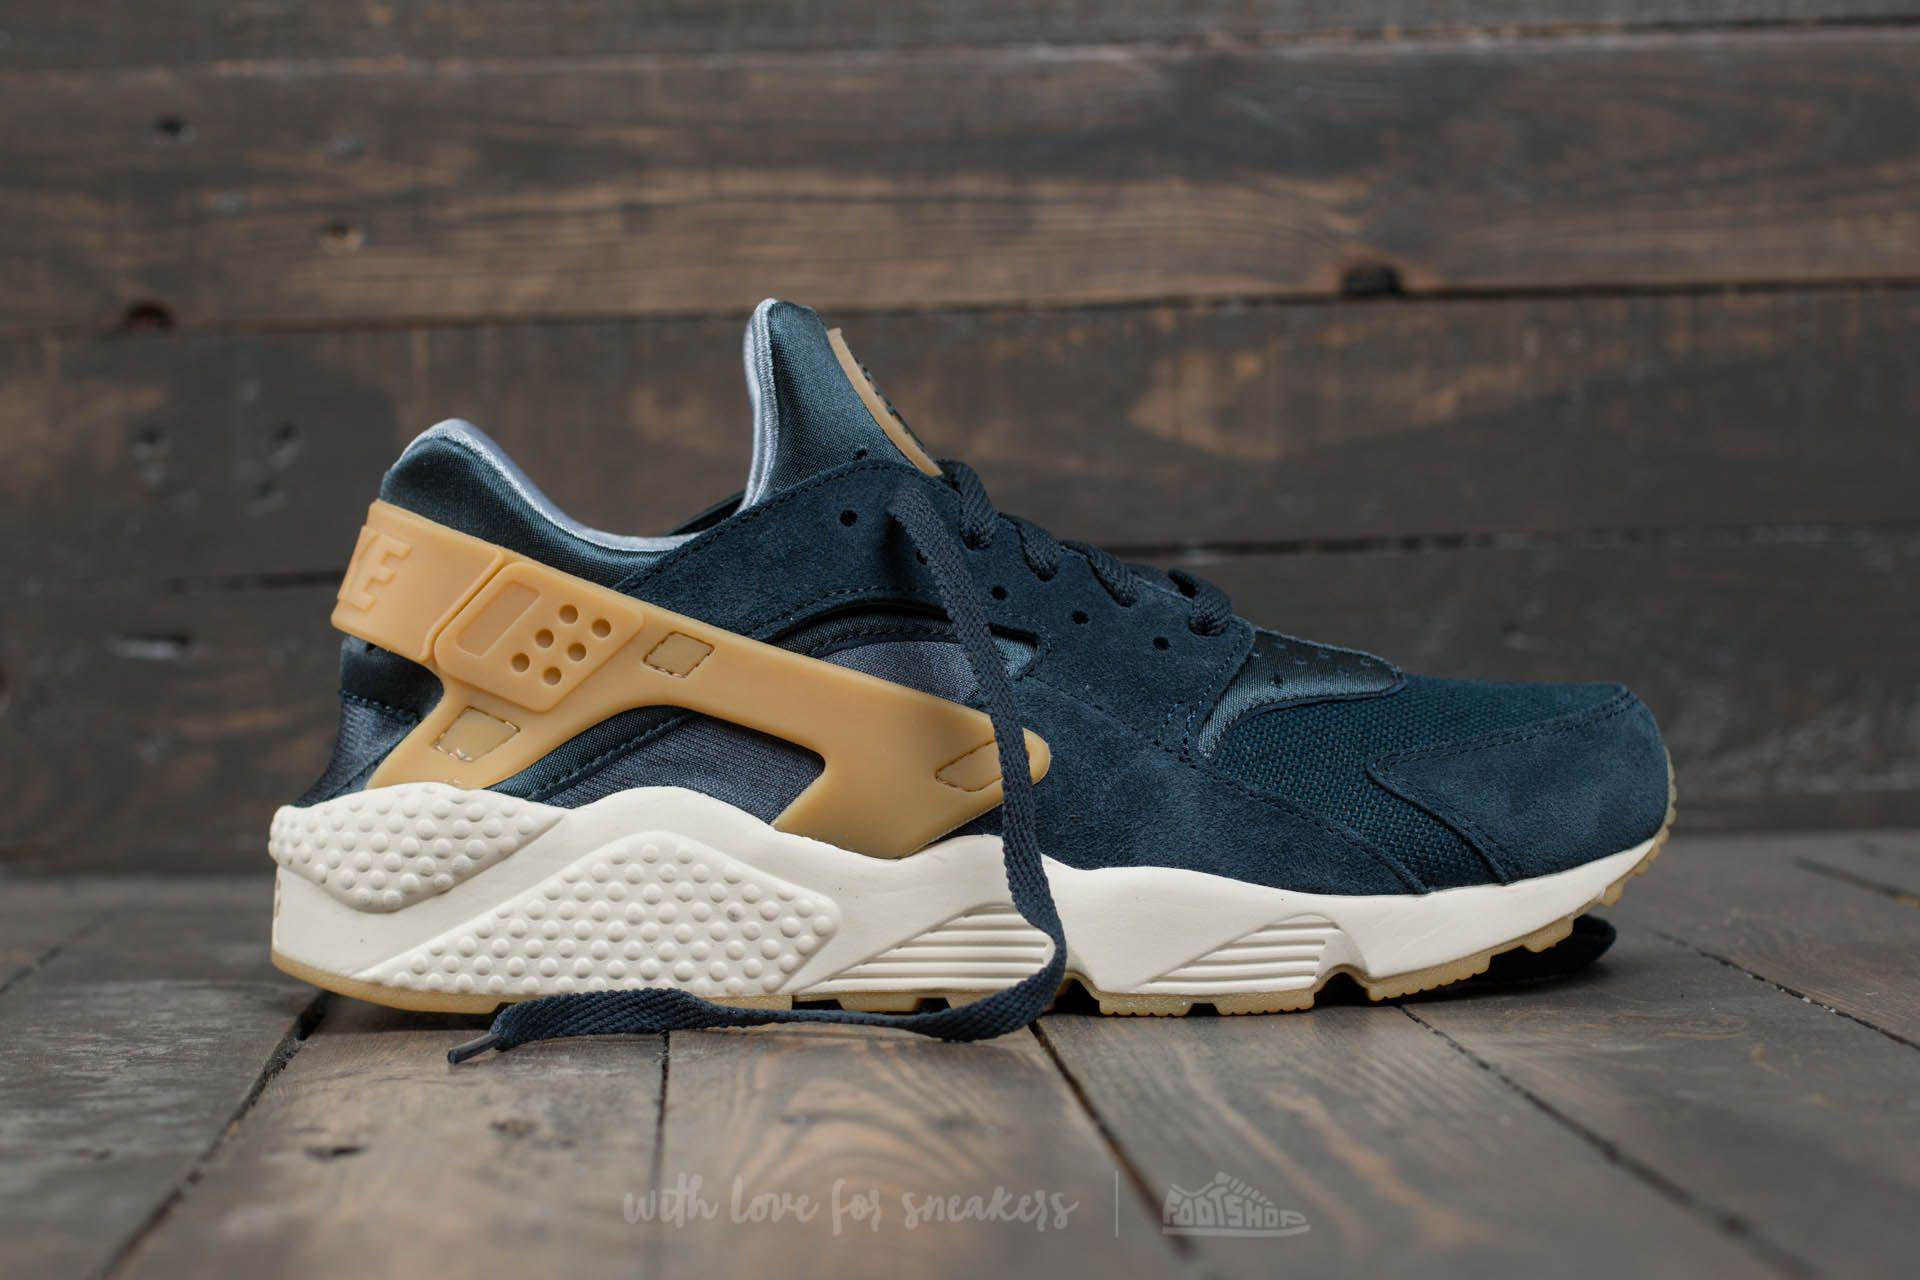 best sneakers 0e522 5b6a4 Lyst - Nike Air Huarache Run Se Armory Navy  Gum Yellow in Blue for Men